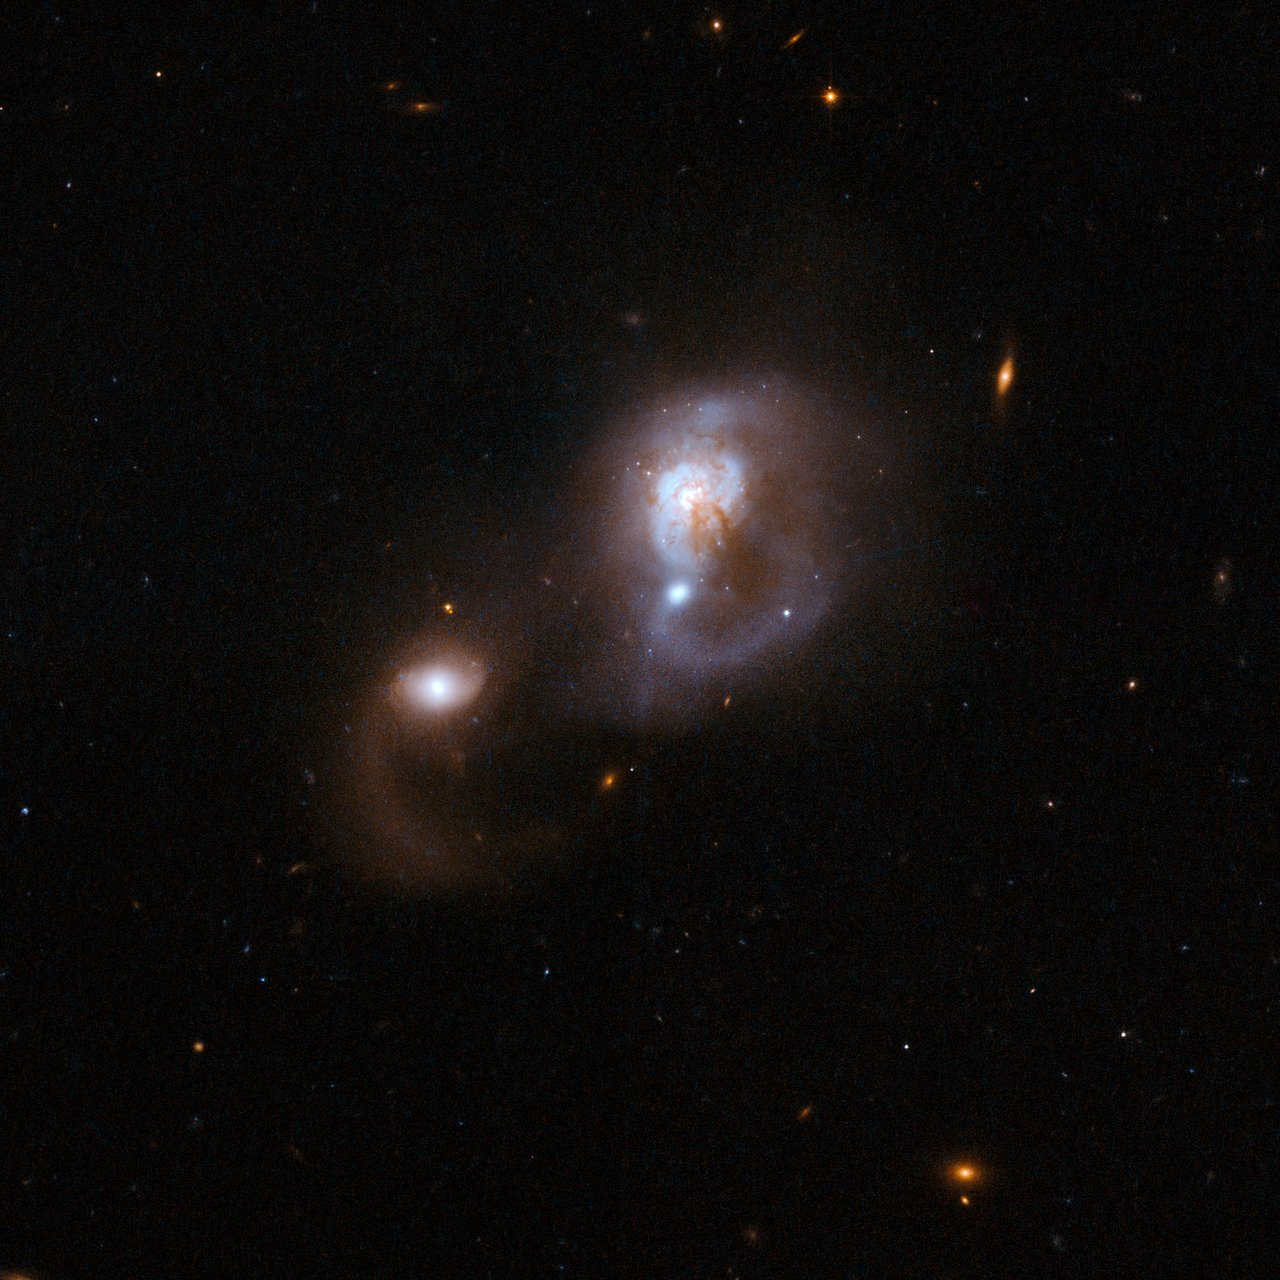 IRAS F10565+2448 | ESA/Hubble